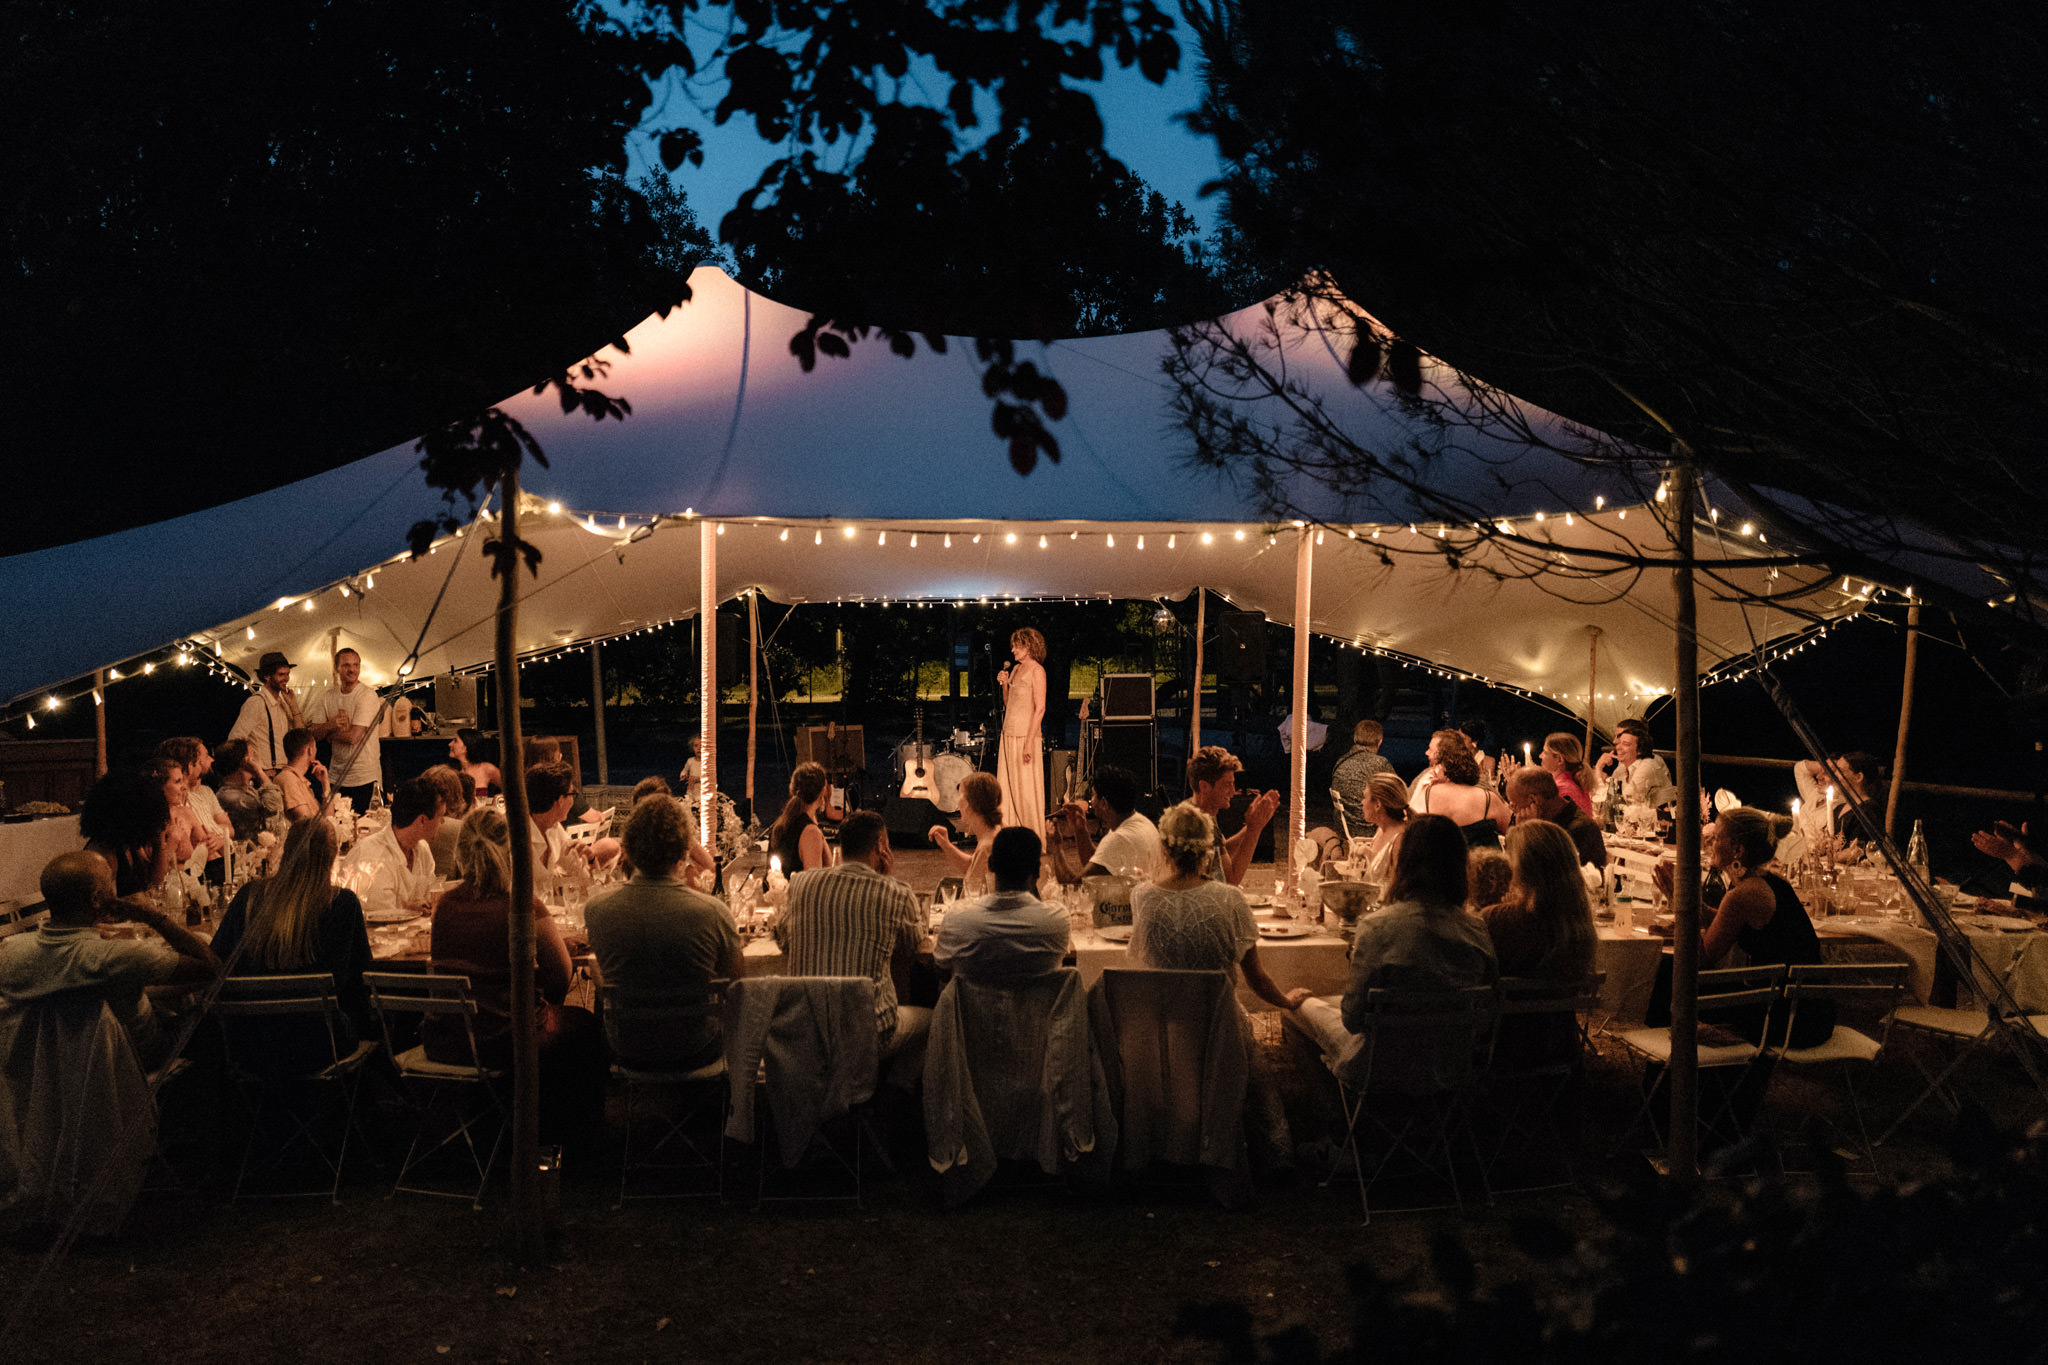 wedding-destination-bordeaux-soiree-tente-sparkly